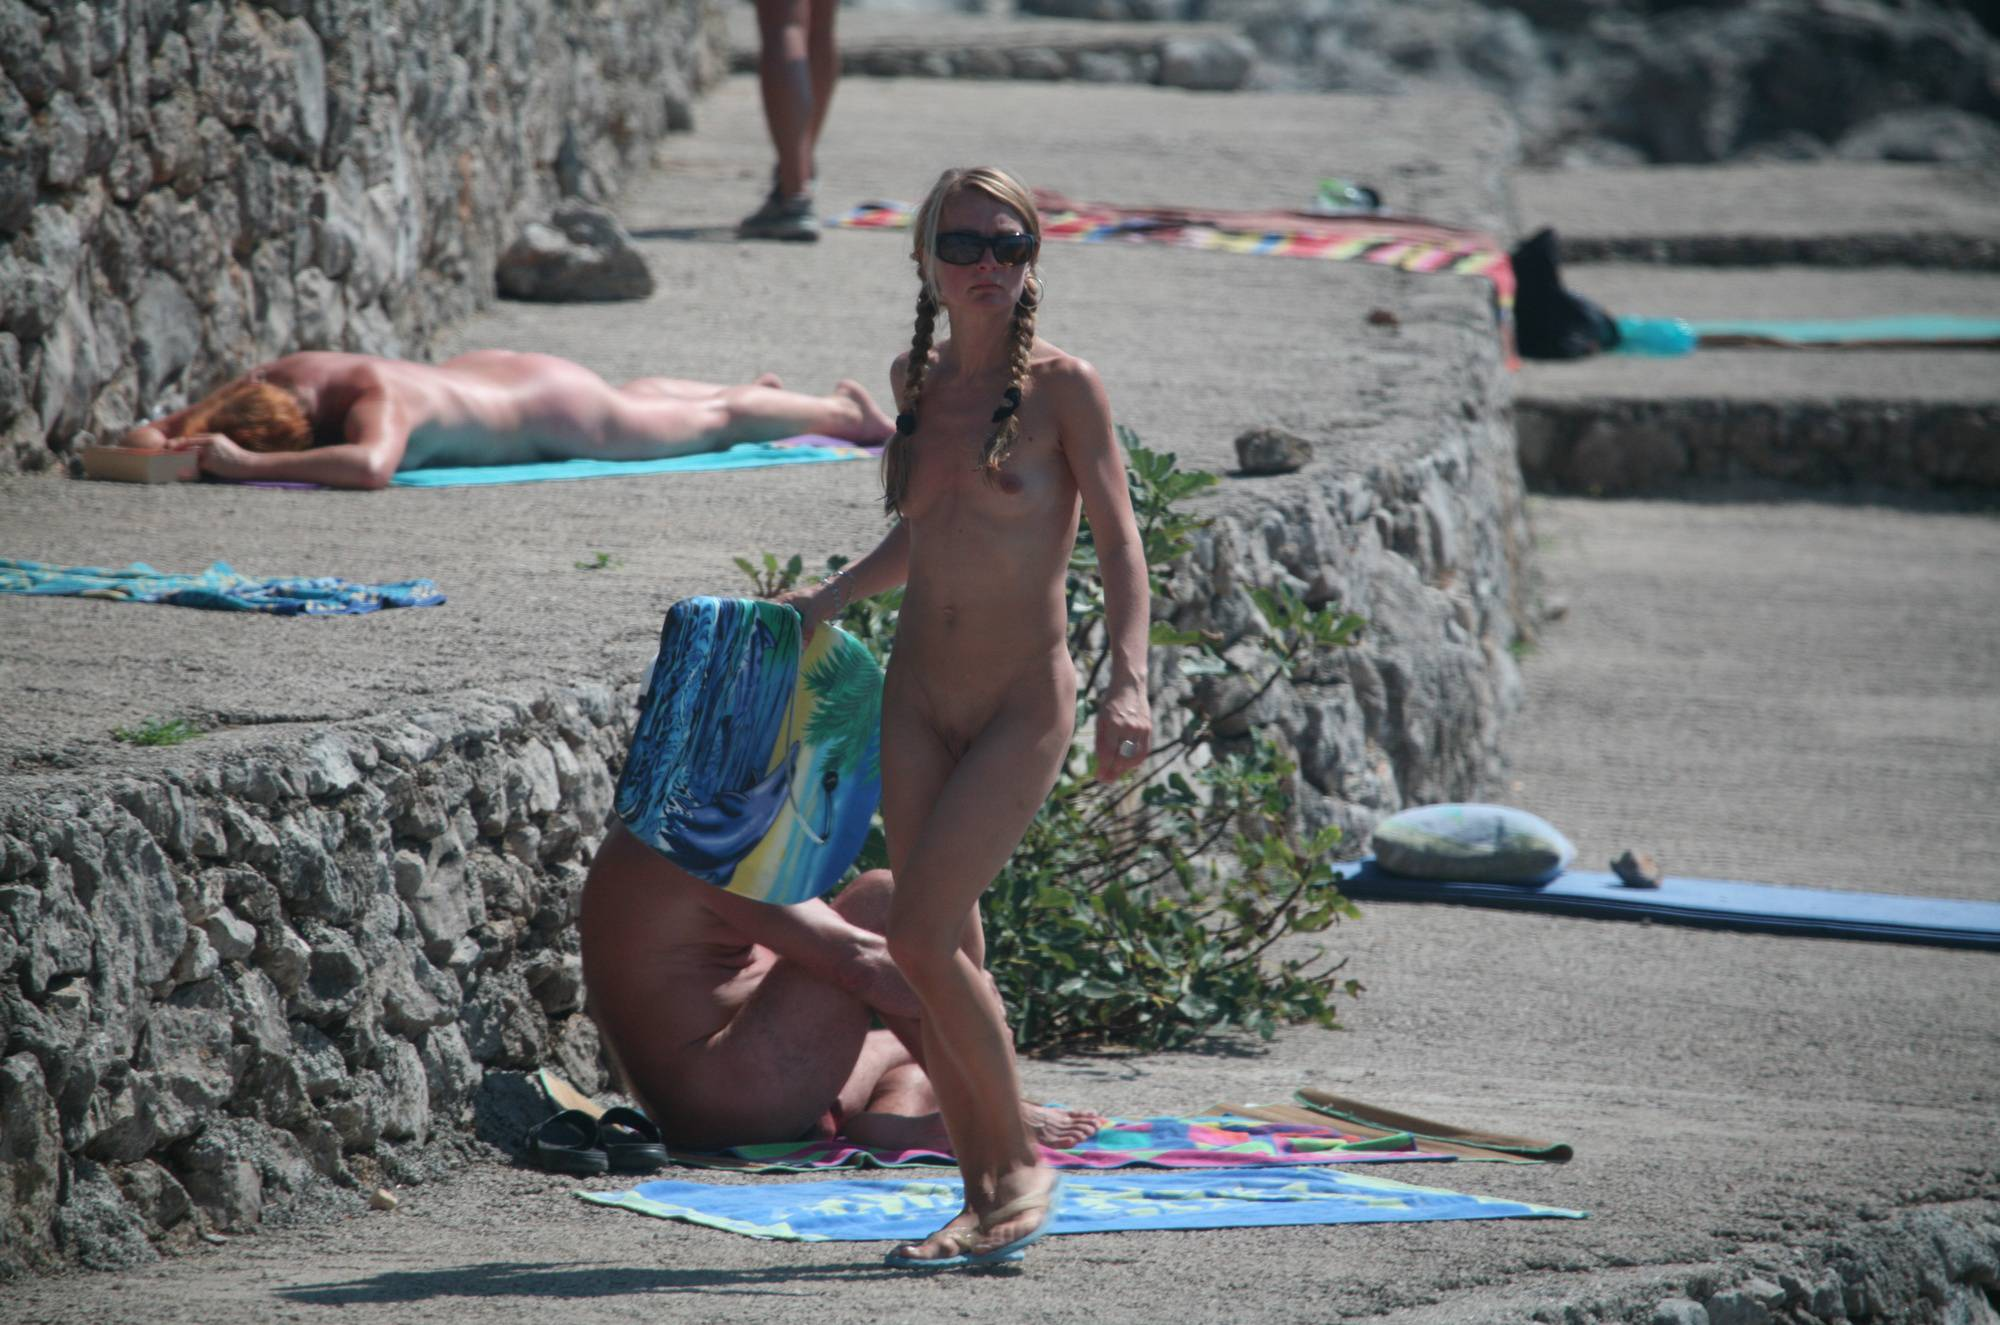 Nudist Pics Crete One Nudist's Profile - 1